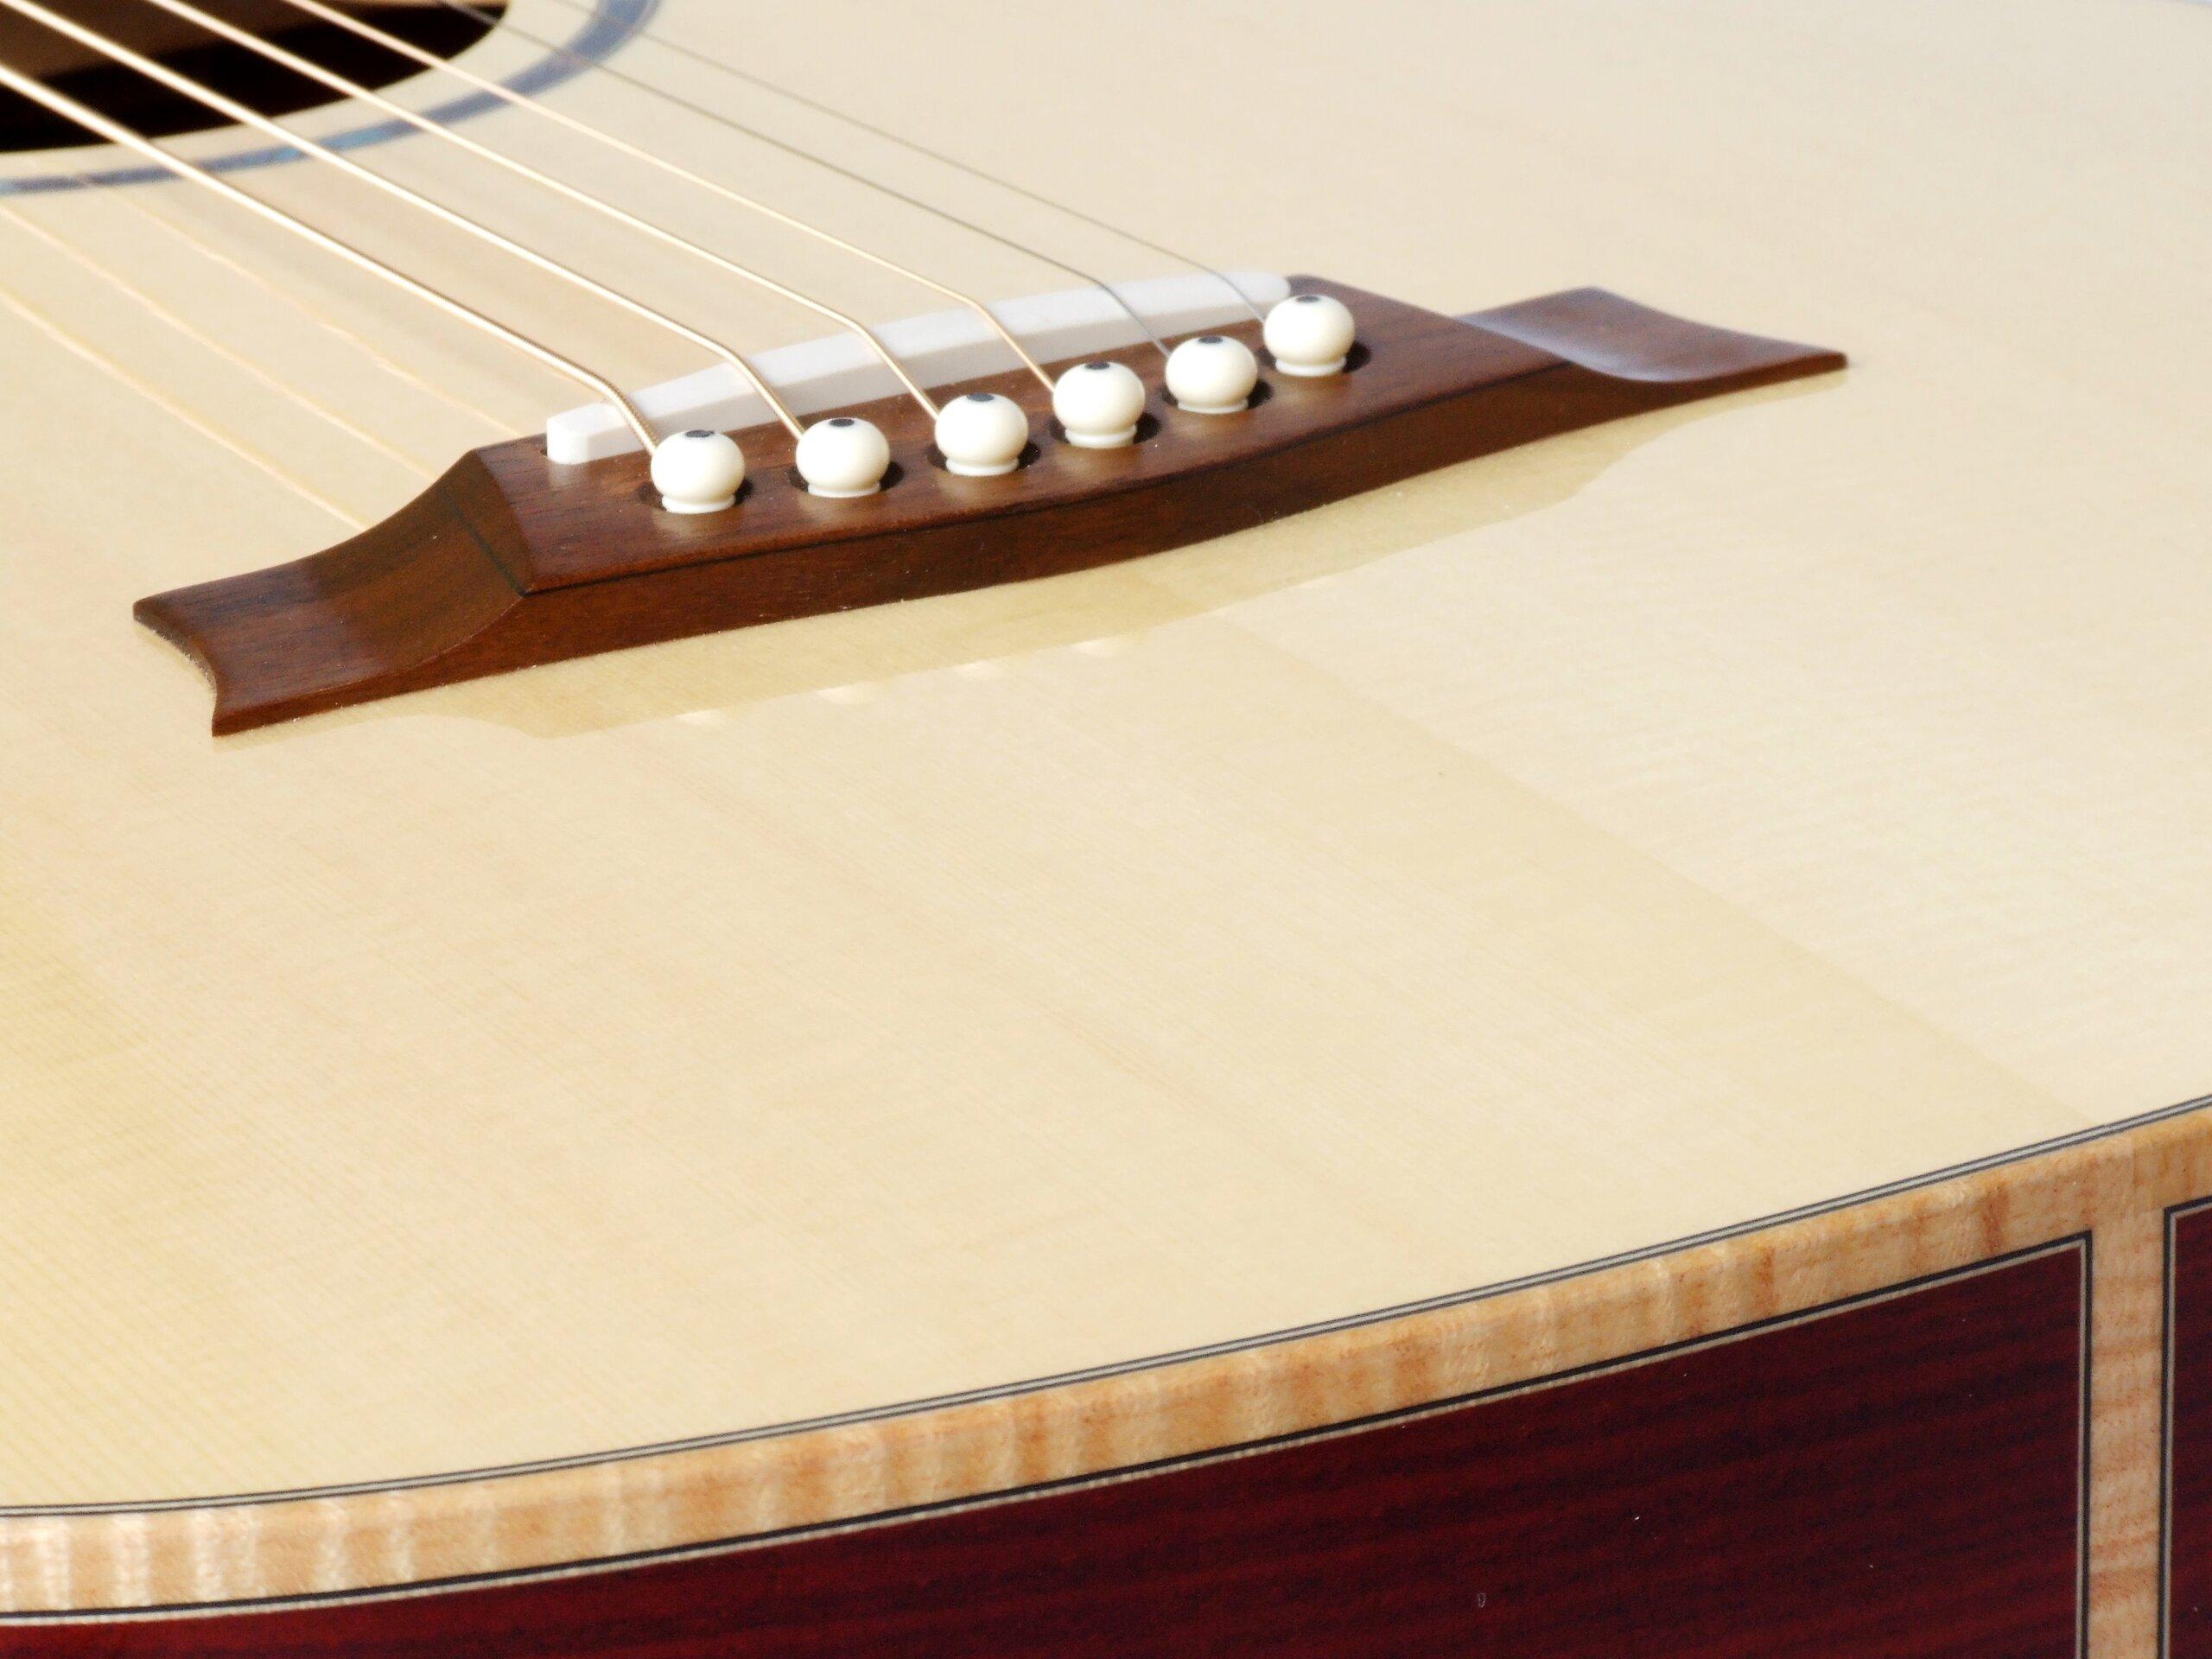 Carbon fibre reinforced bridge on a steel string guitar